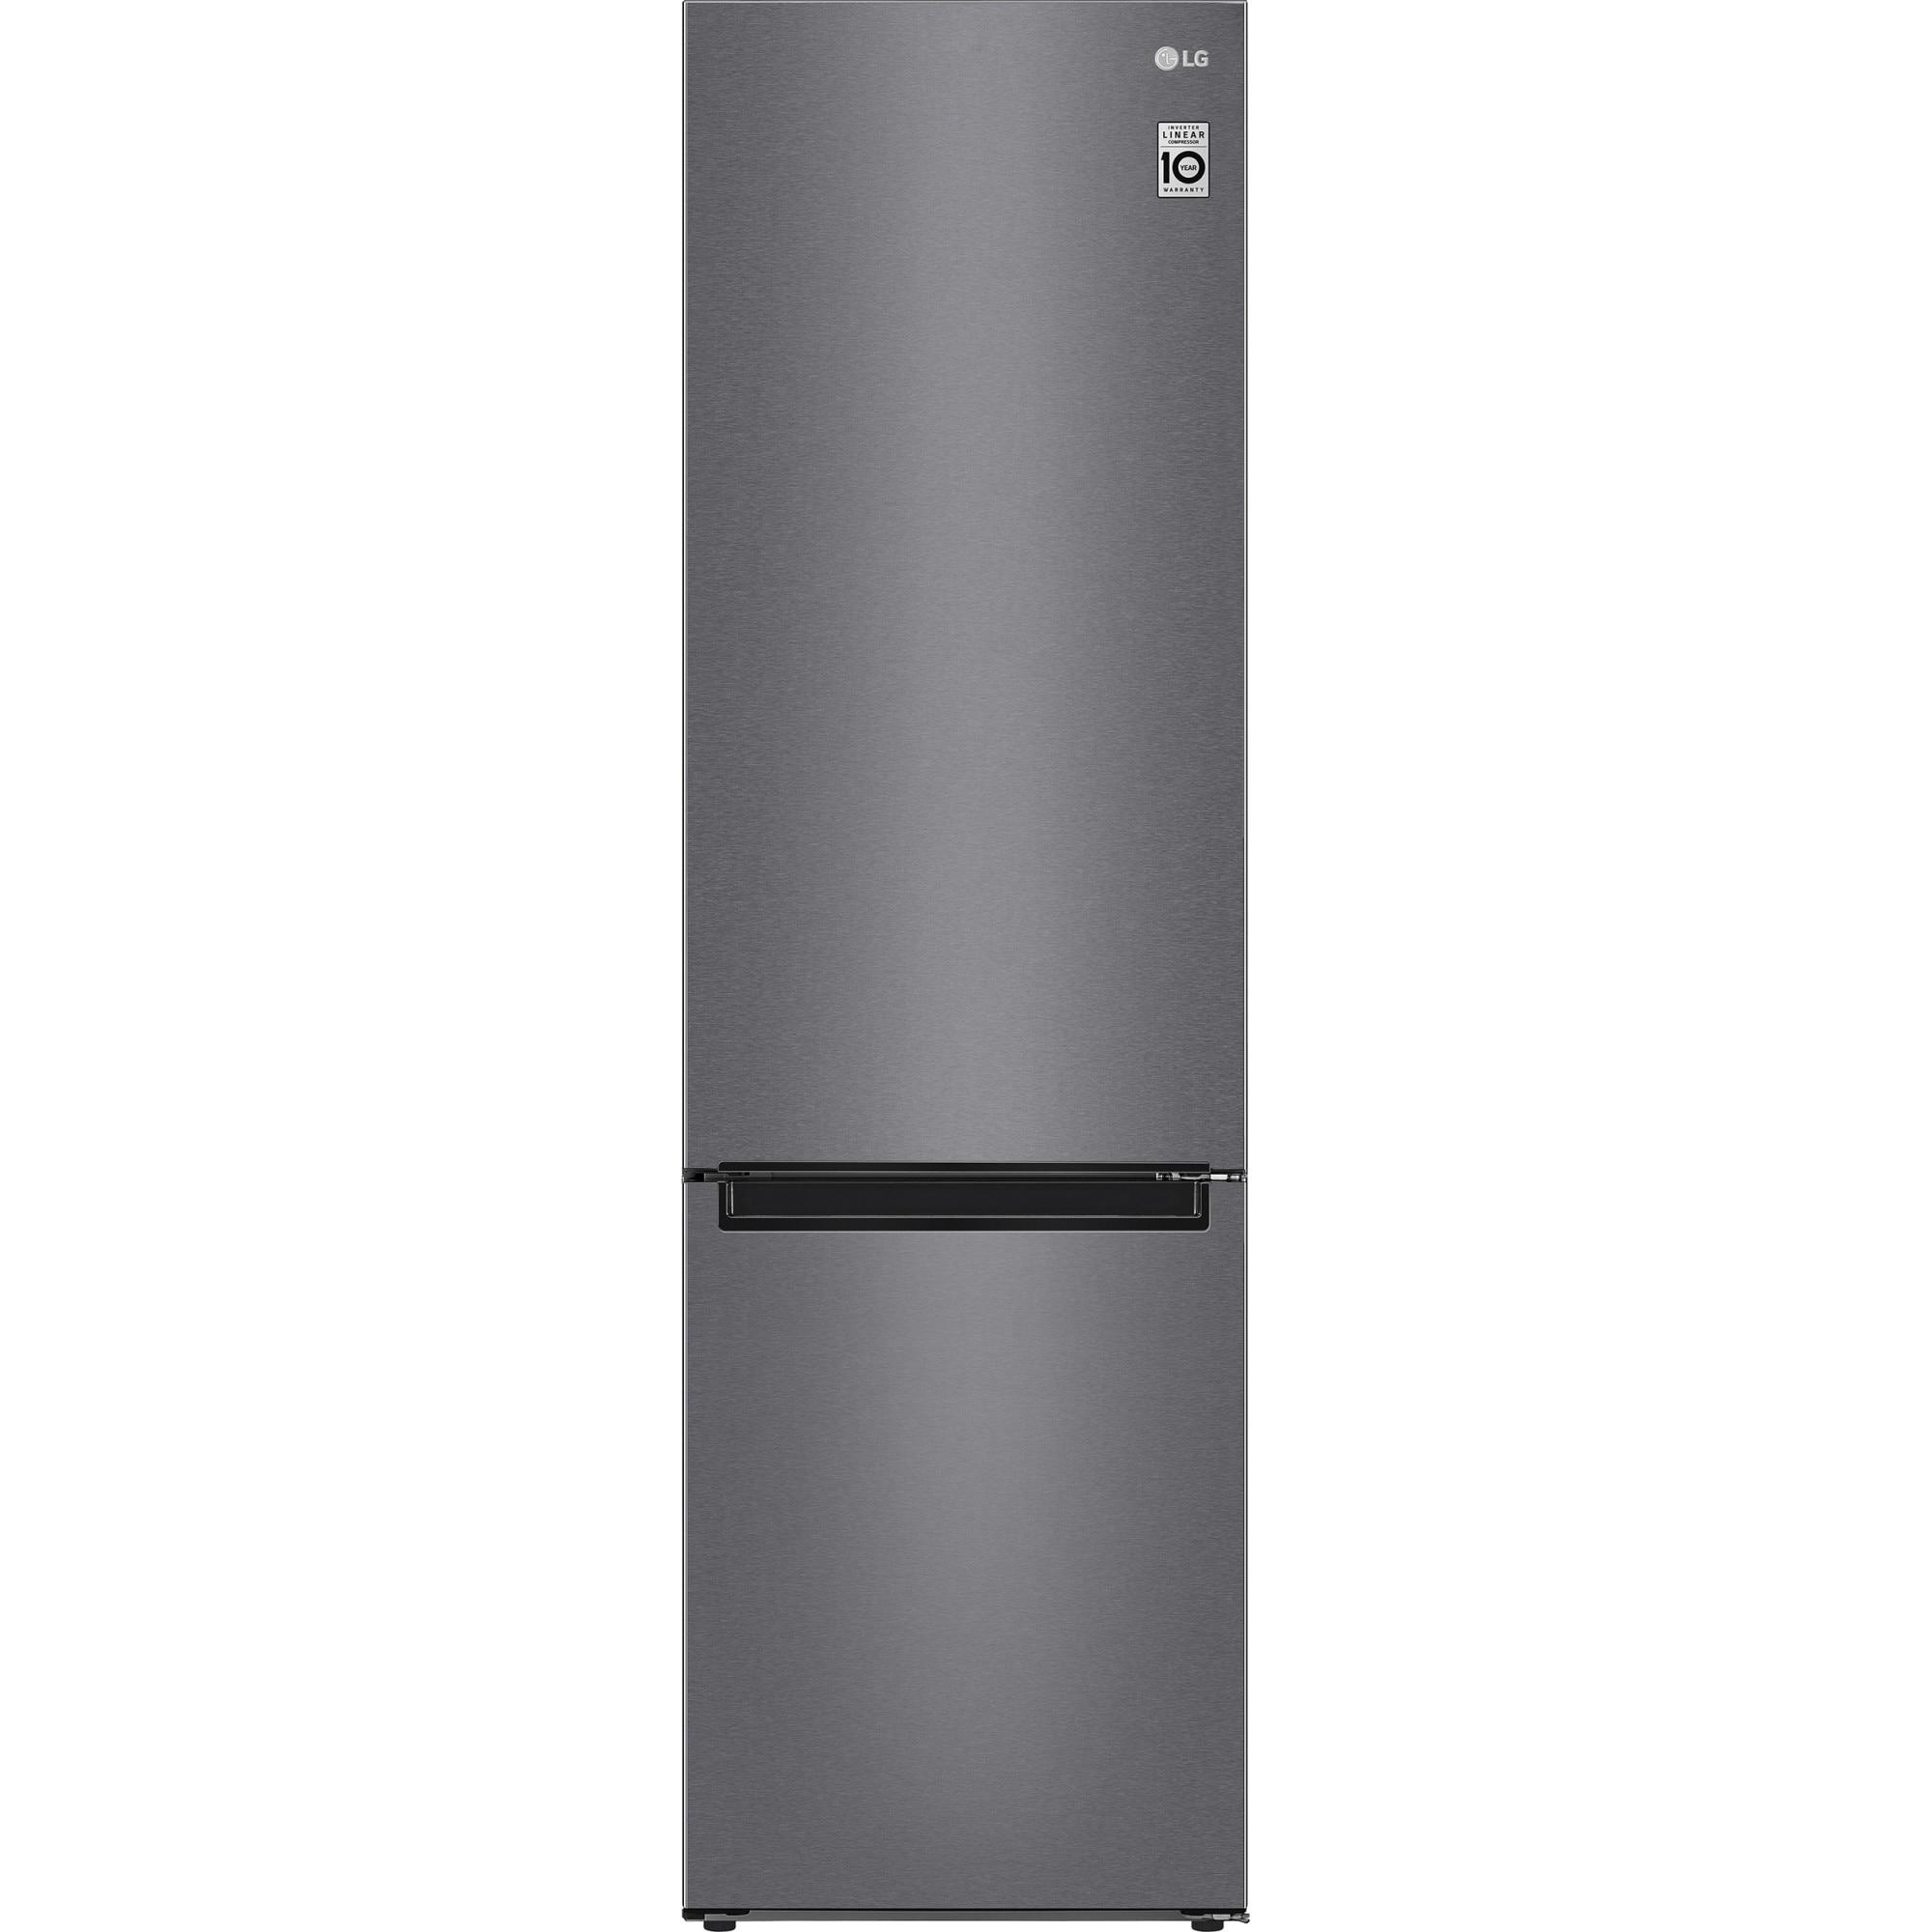 Fotografie Combina frigorifica LG GBP62DSSFR, 384 l, Clasa A+++, No Frost, Compresor Liniar Inverter, Display, Dark Graphite